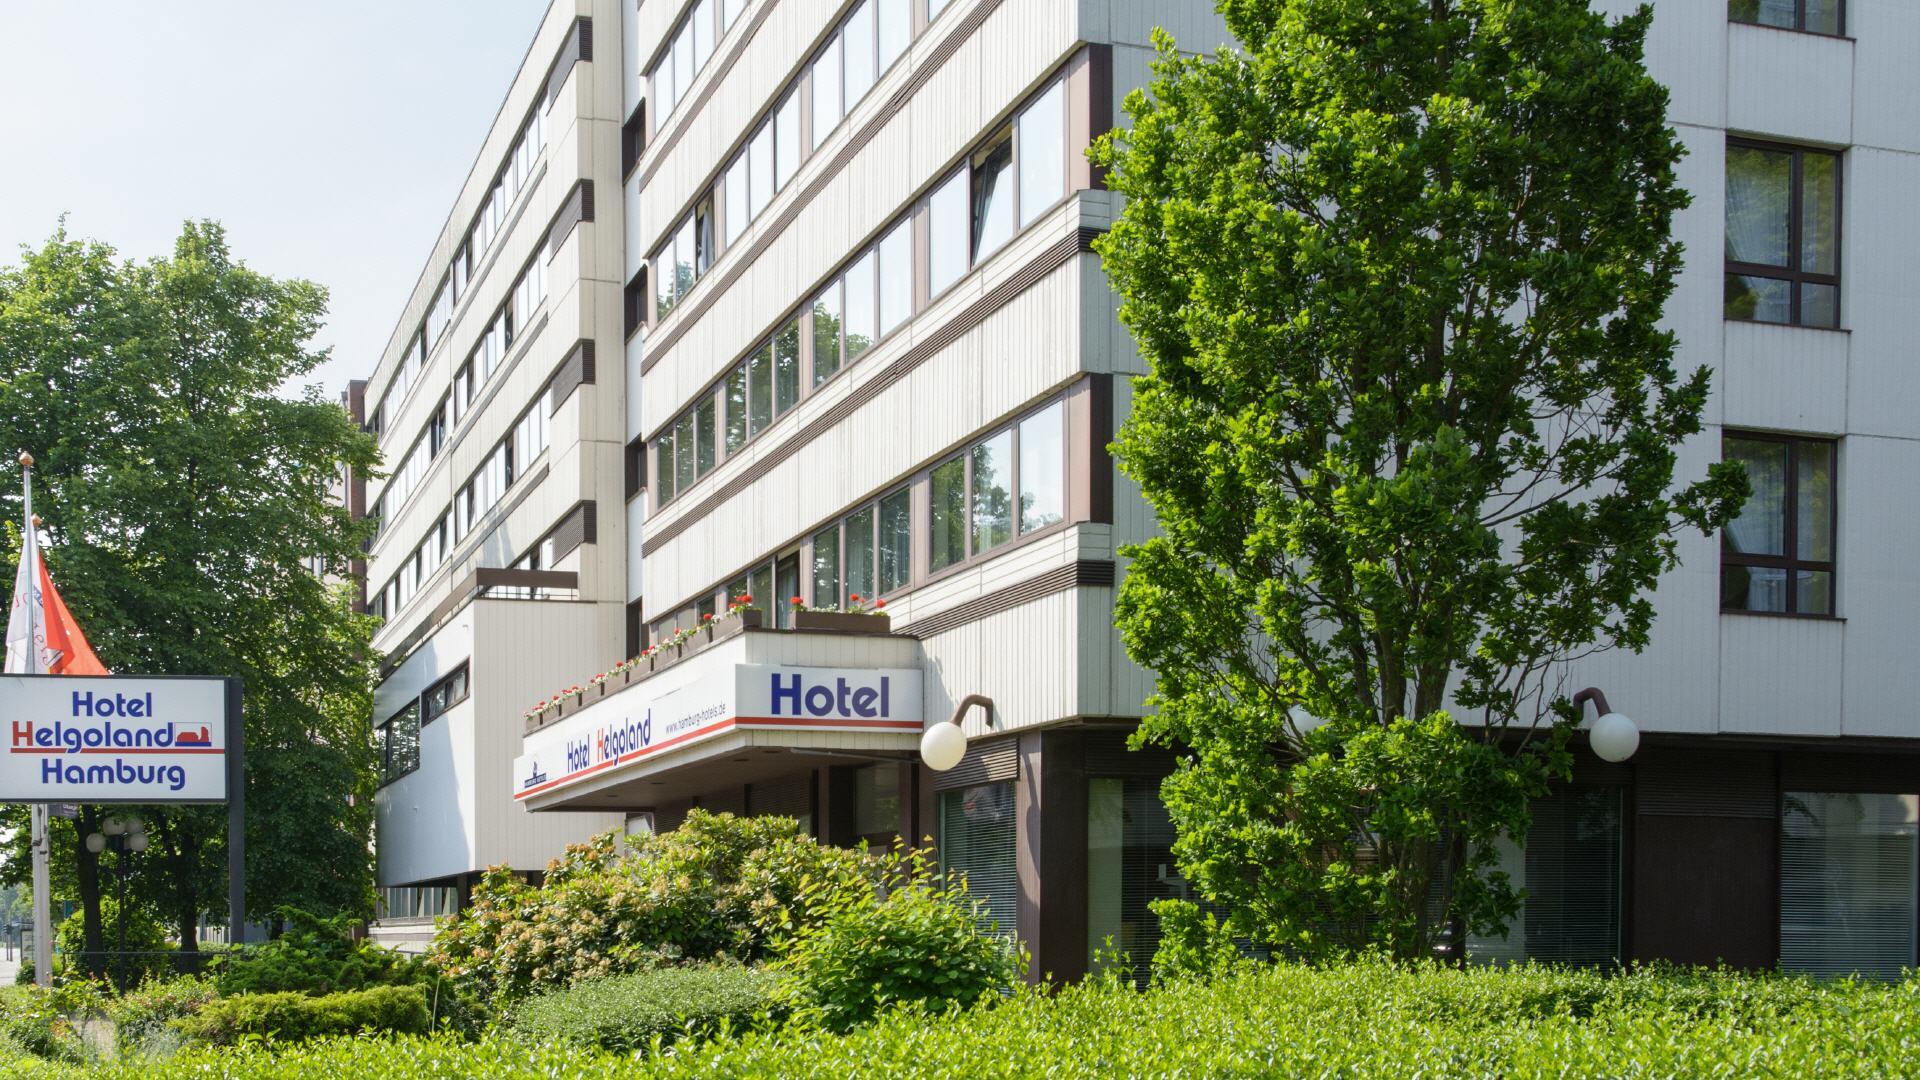 Hotel Stadt Hamburg Helgoland